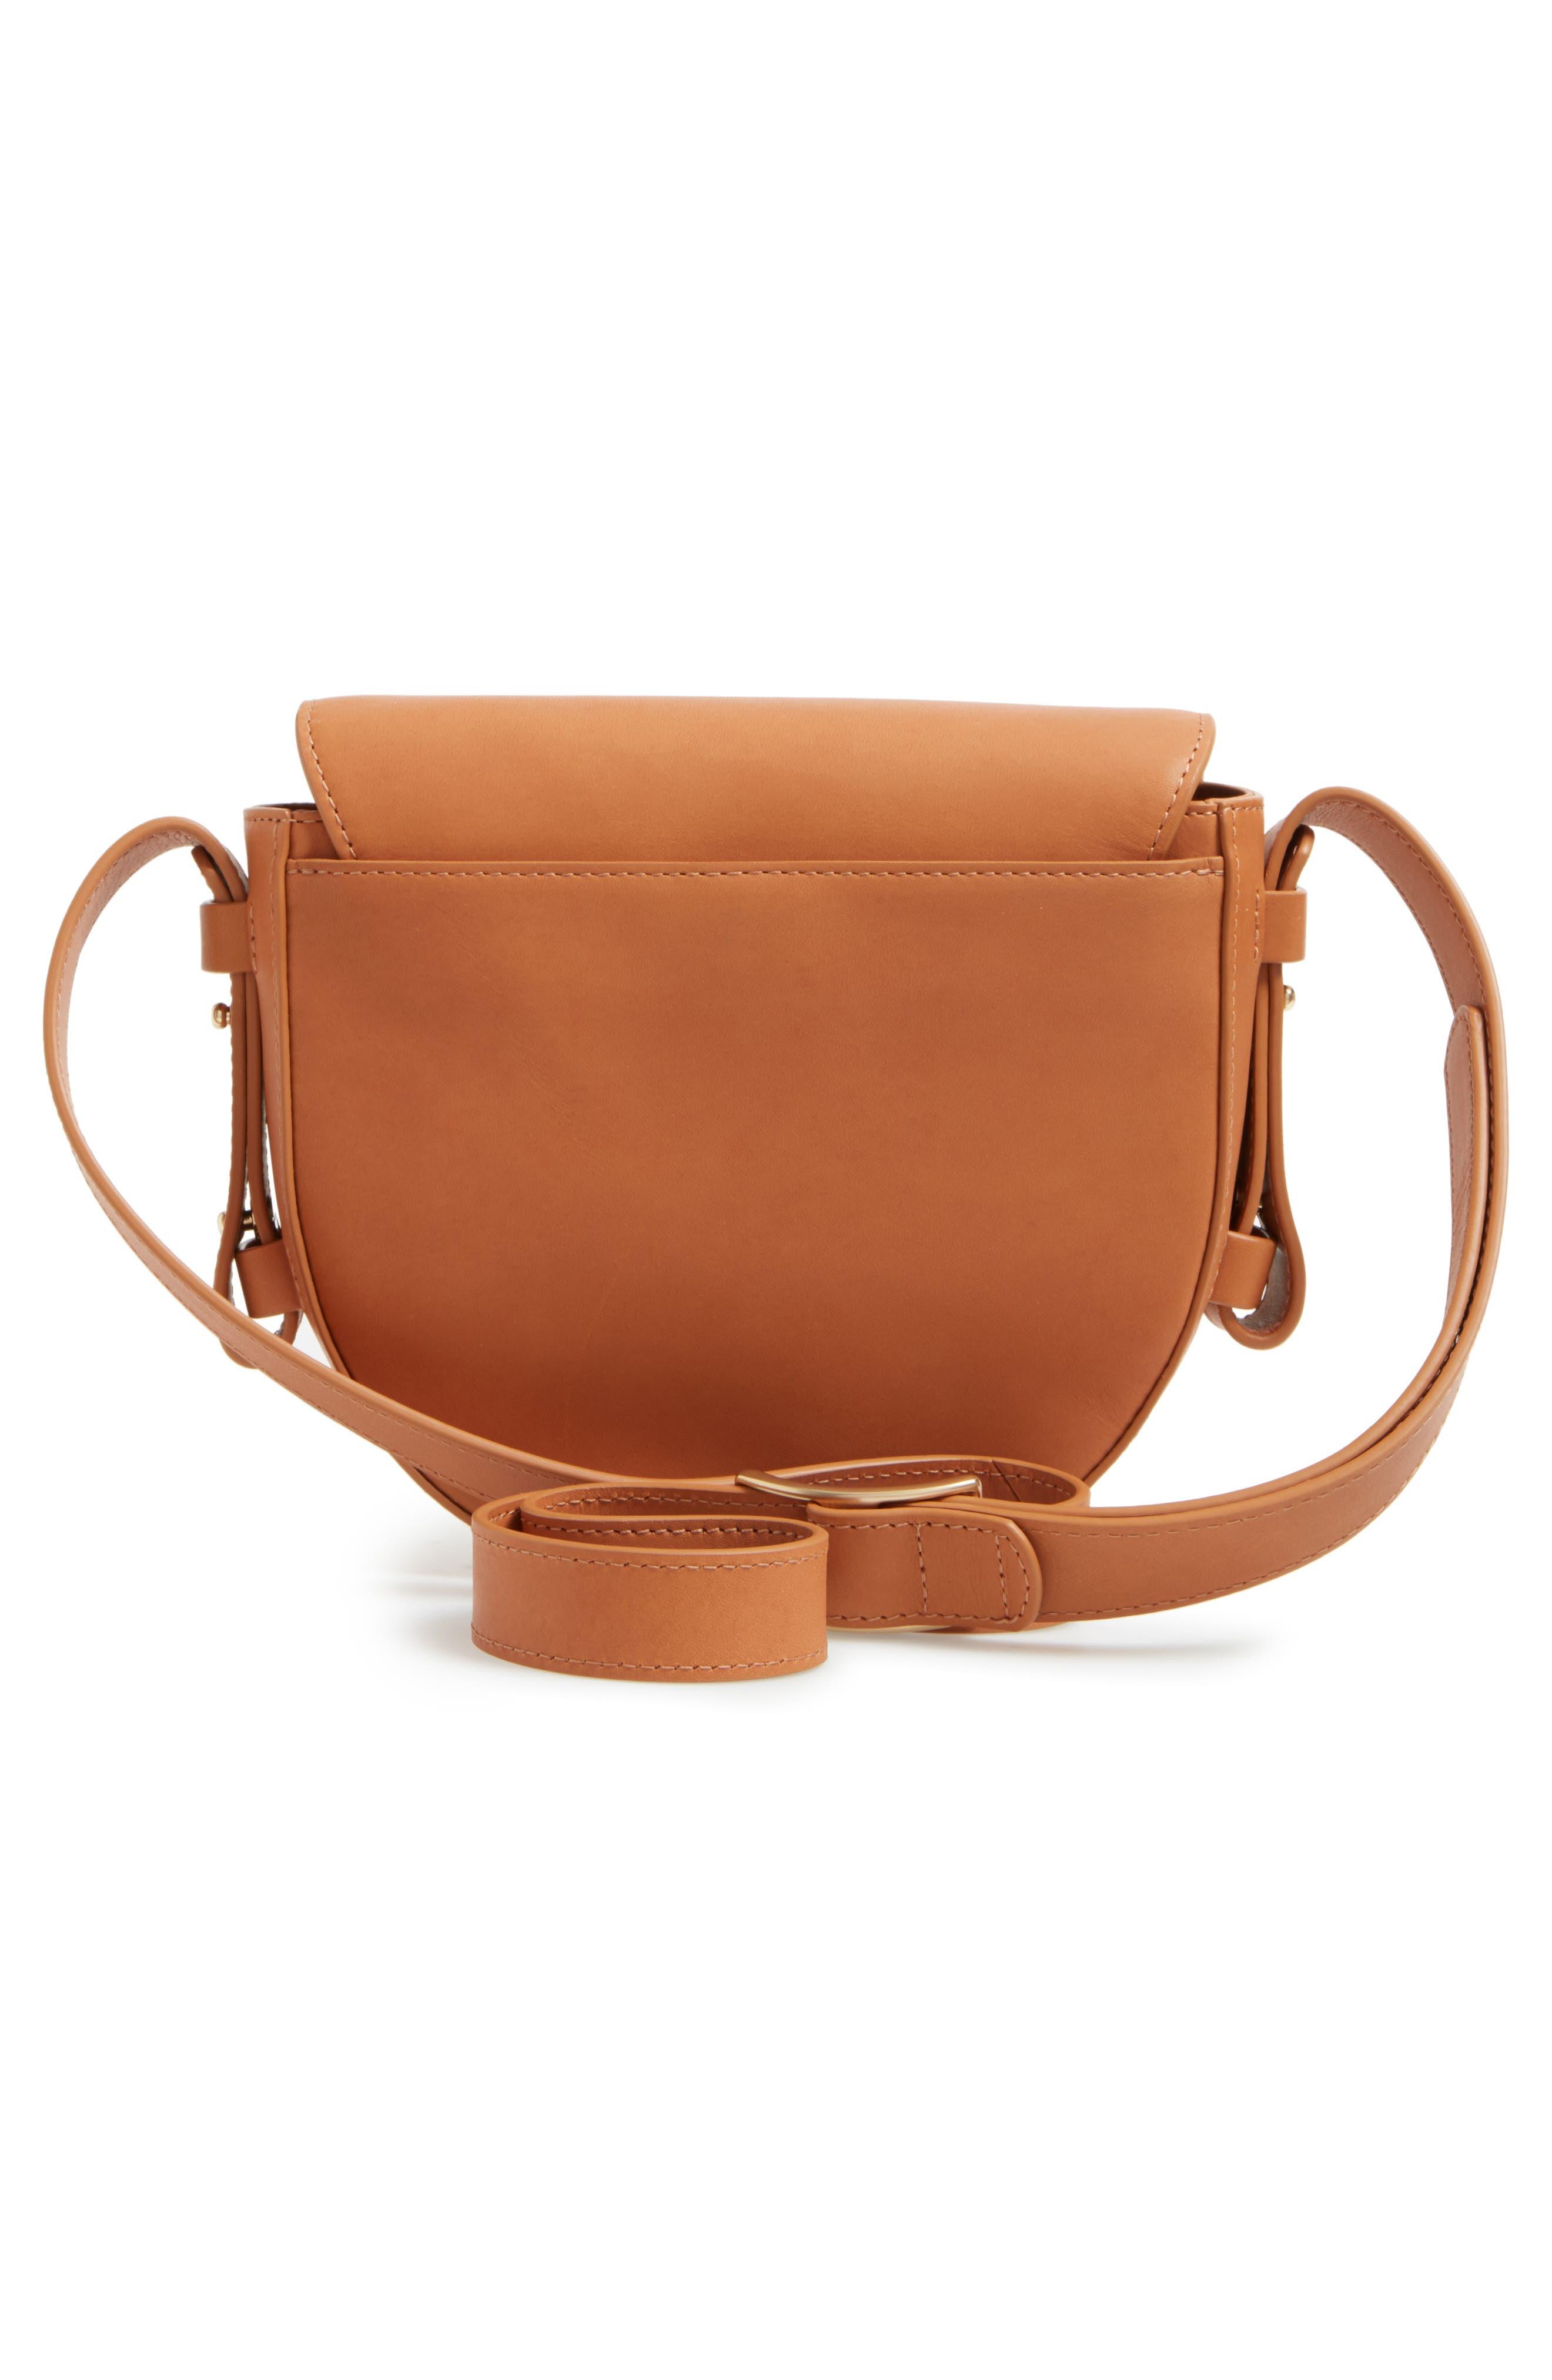 Lobelle Leather Saddle Bag,                             Alternate thumbnail 3, color,                             Tan